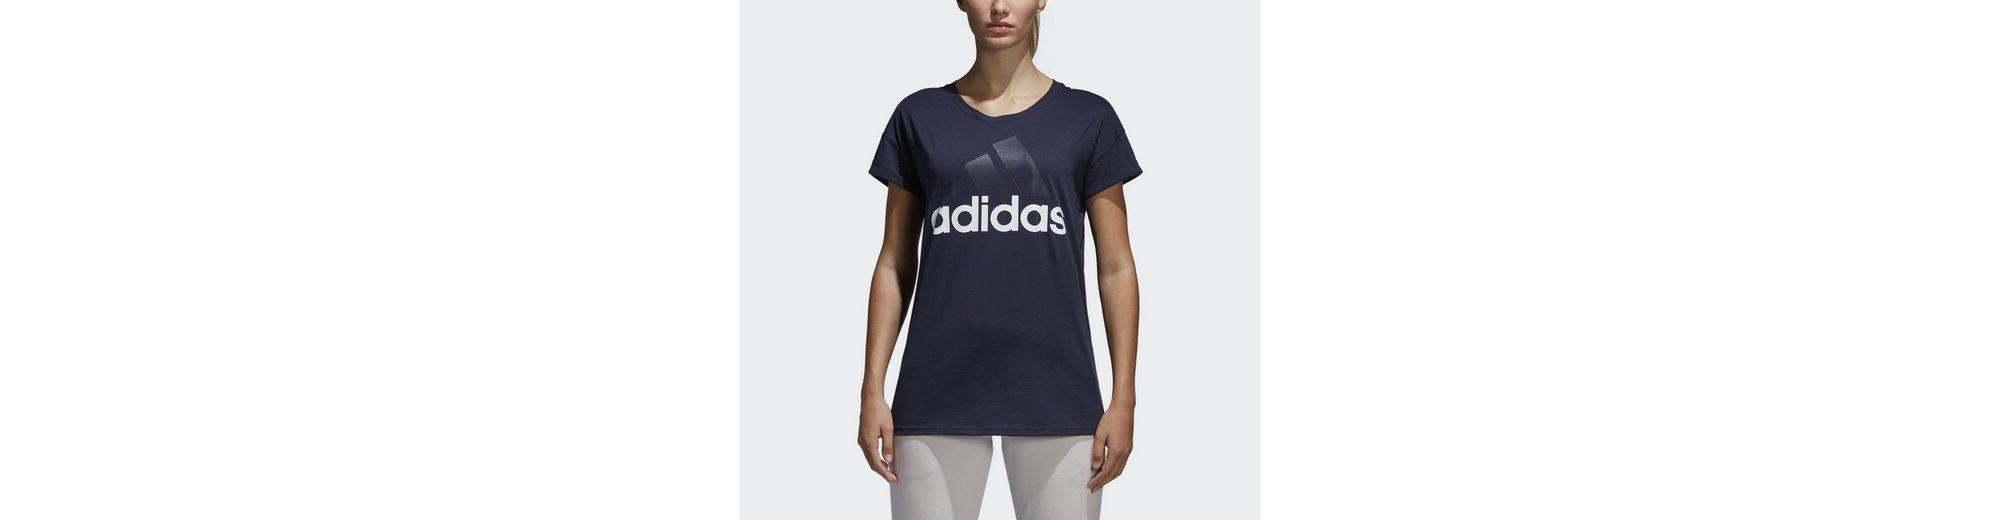 adidas Performance Sporttop Essentials Linear Loose T-Shirt 2018 Unisex Günstig Online WewpD6tTT